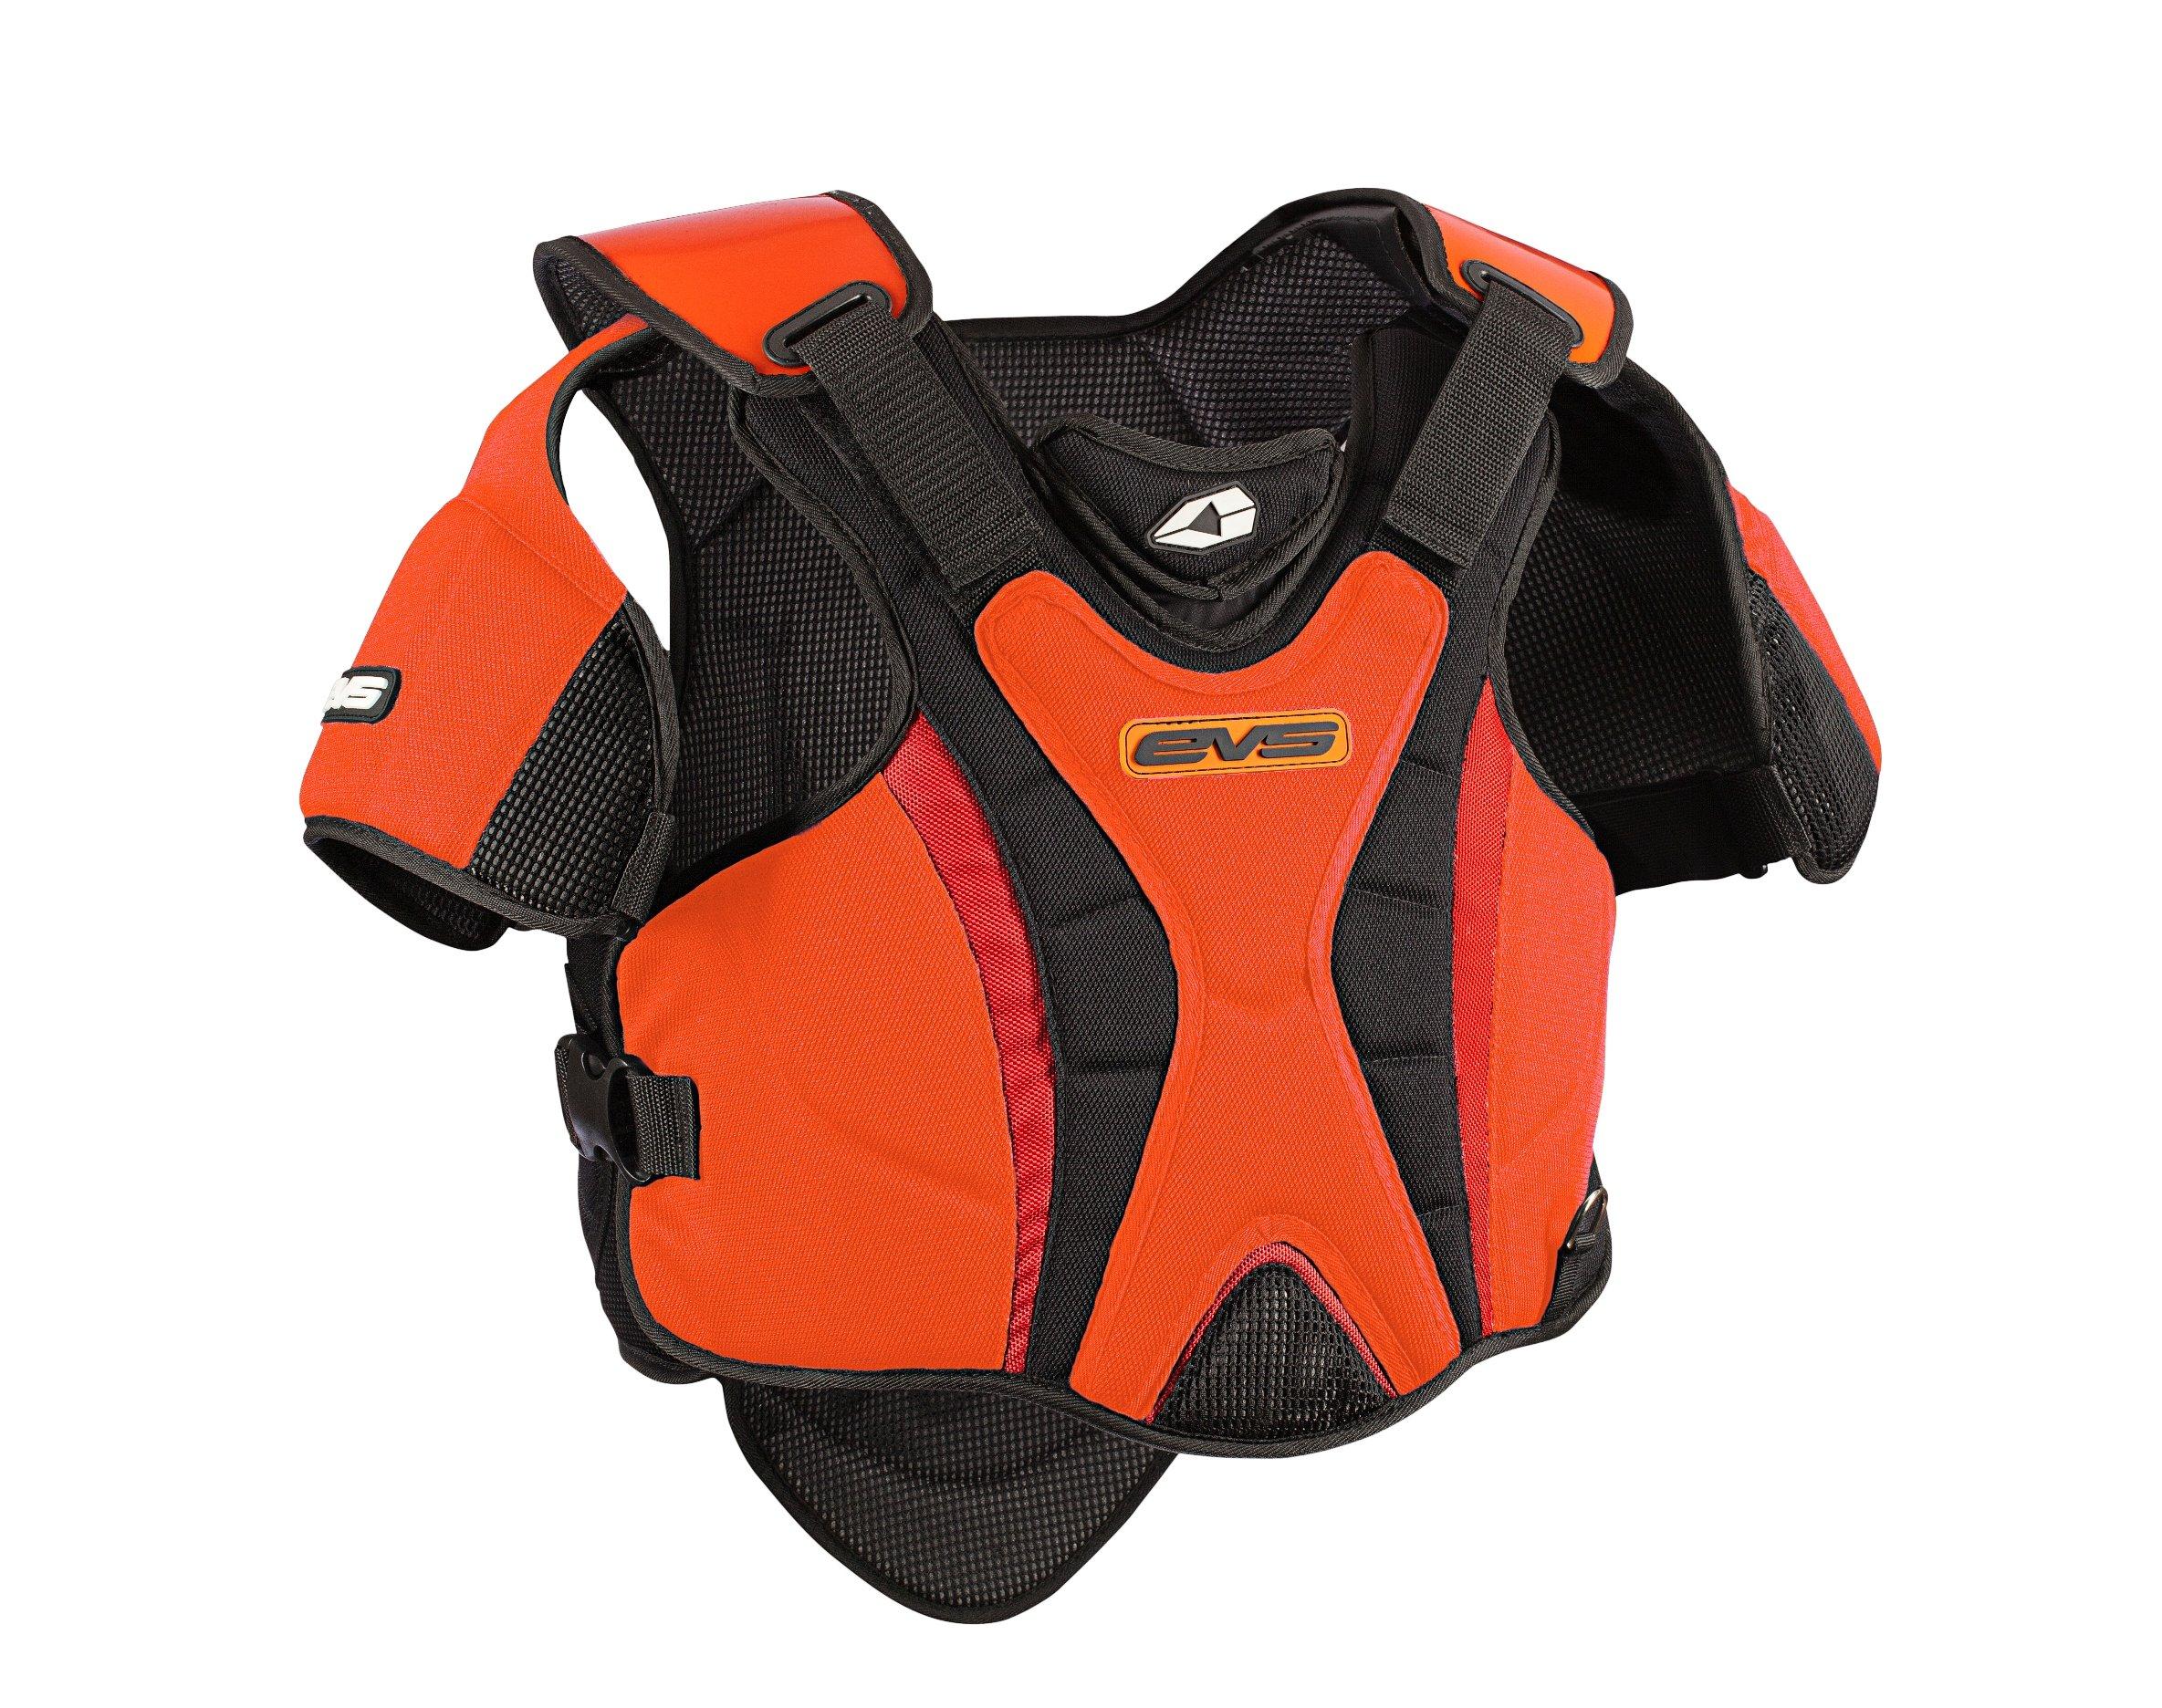 EVS Sports SV1R Race Ready Protective Snow Vest (Black/Orange, Medium/Large) by EVS Sports